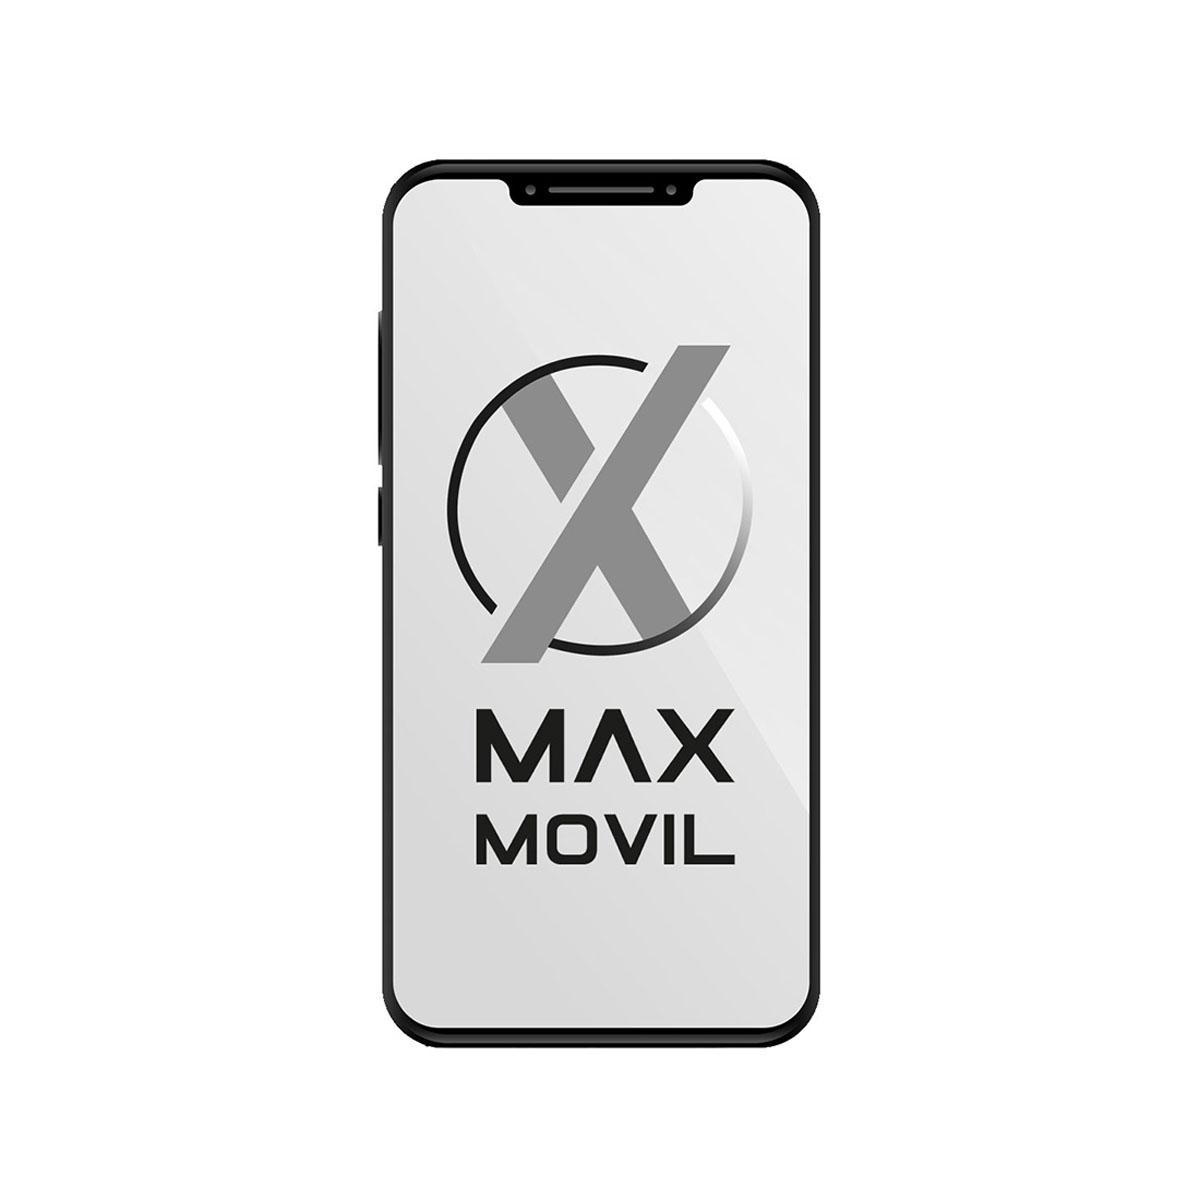 Apple iPhone 8 Plus 256 GB Gris espacial MQ8P2QL/A